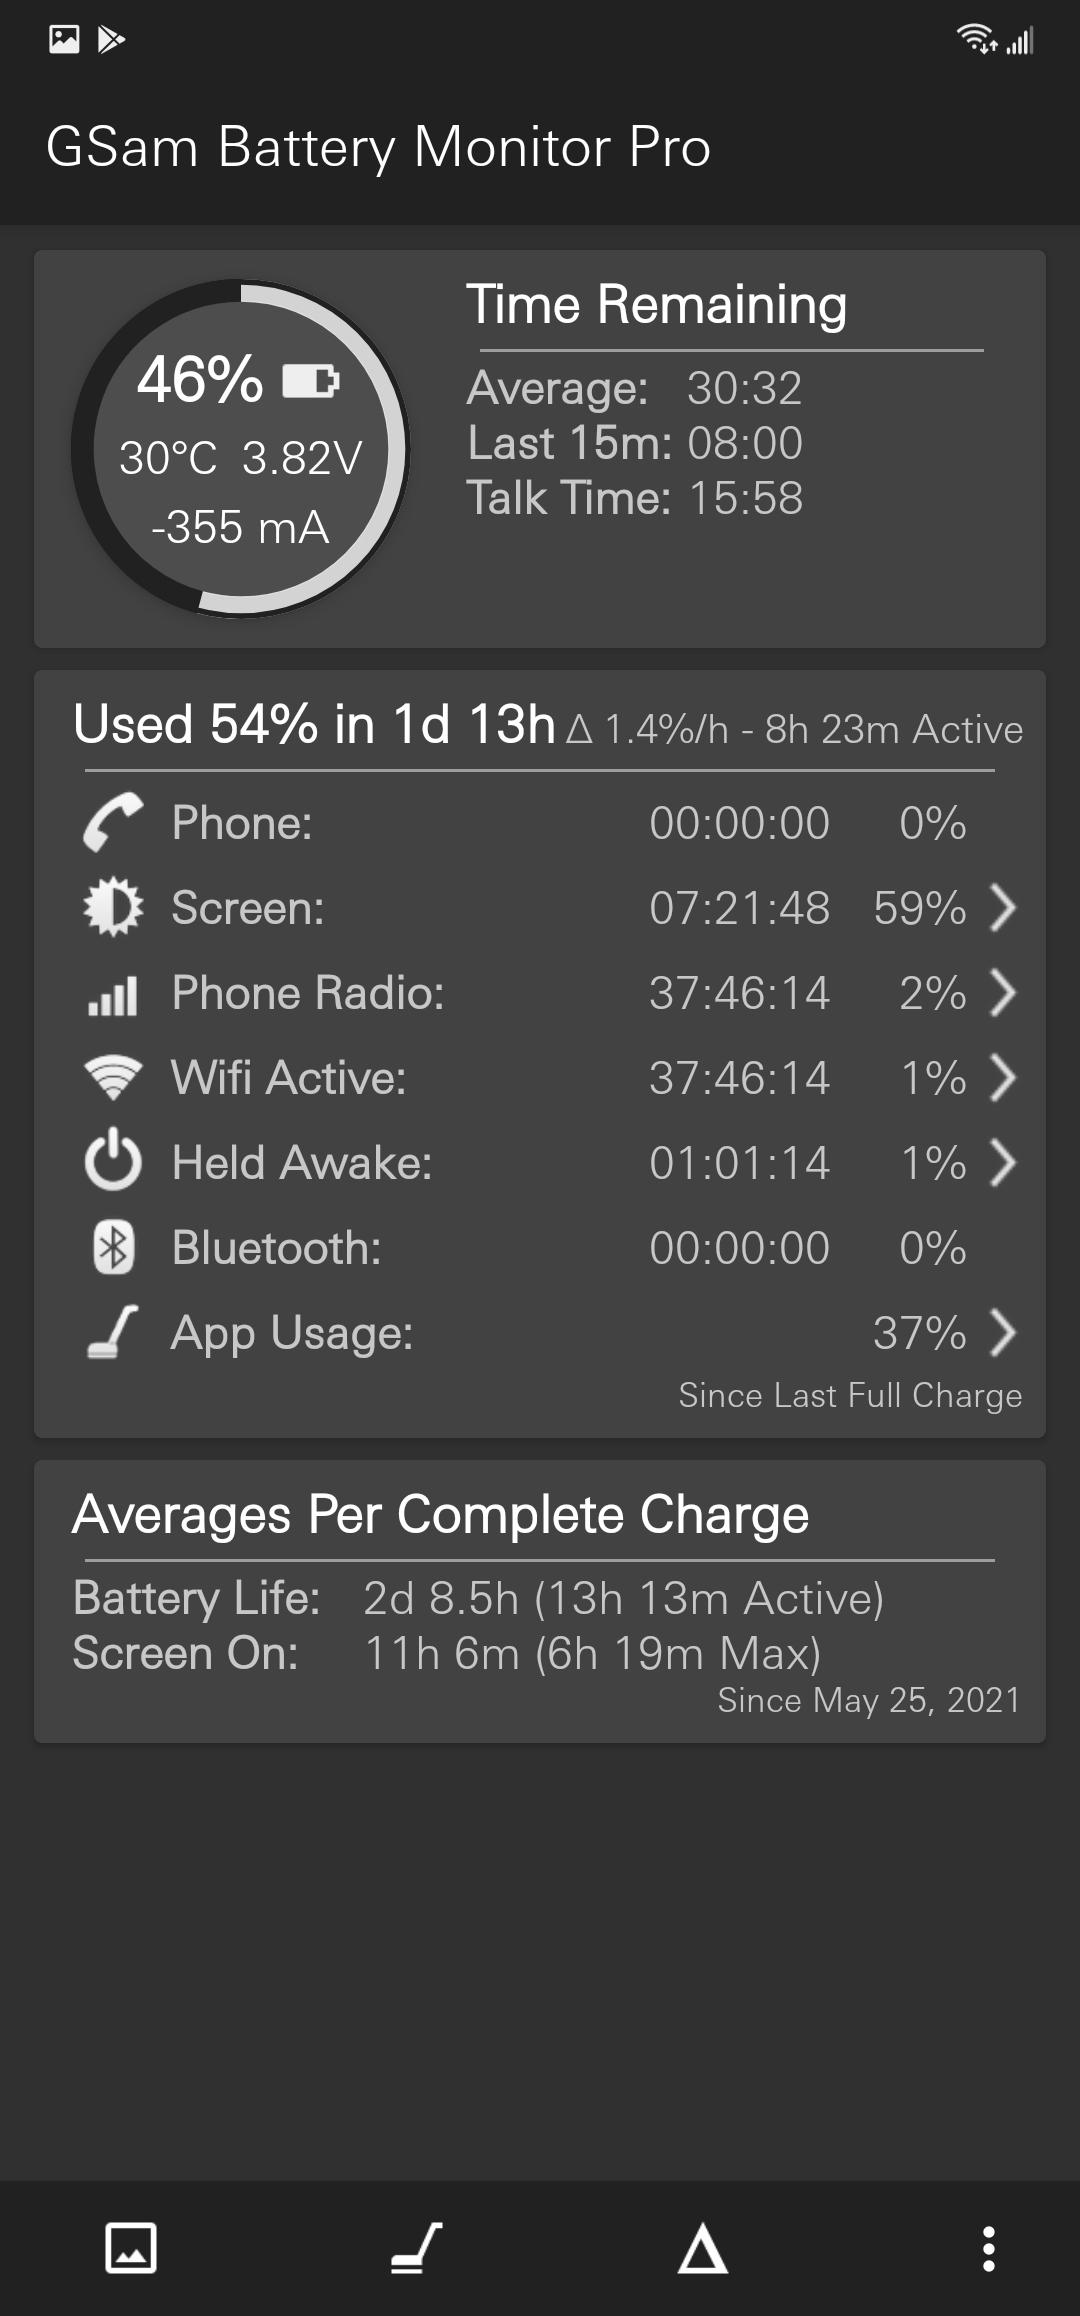 Screenshot_20210612-021713_GSam Battery Monitor Pro.jpg